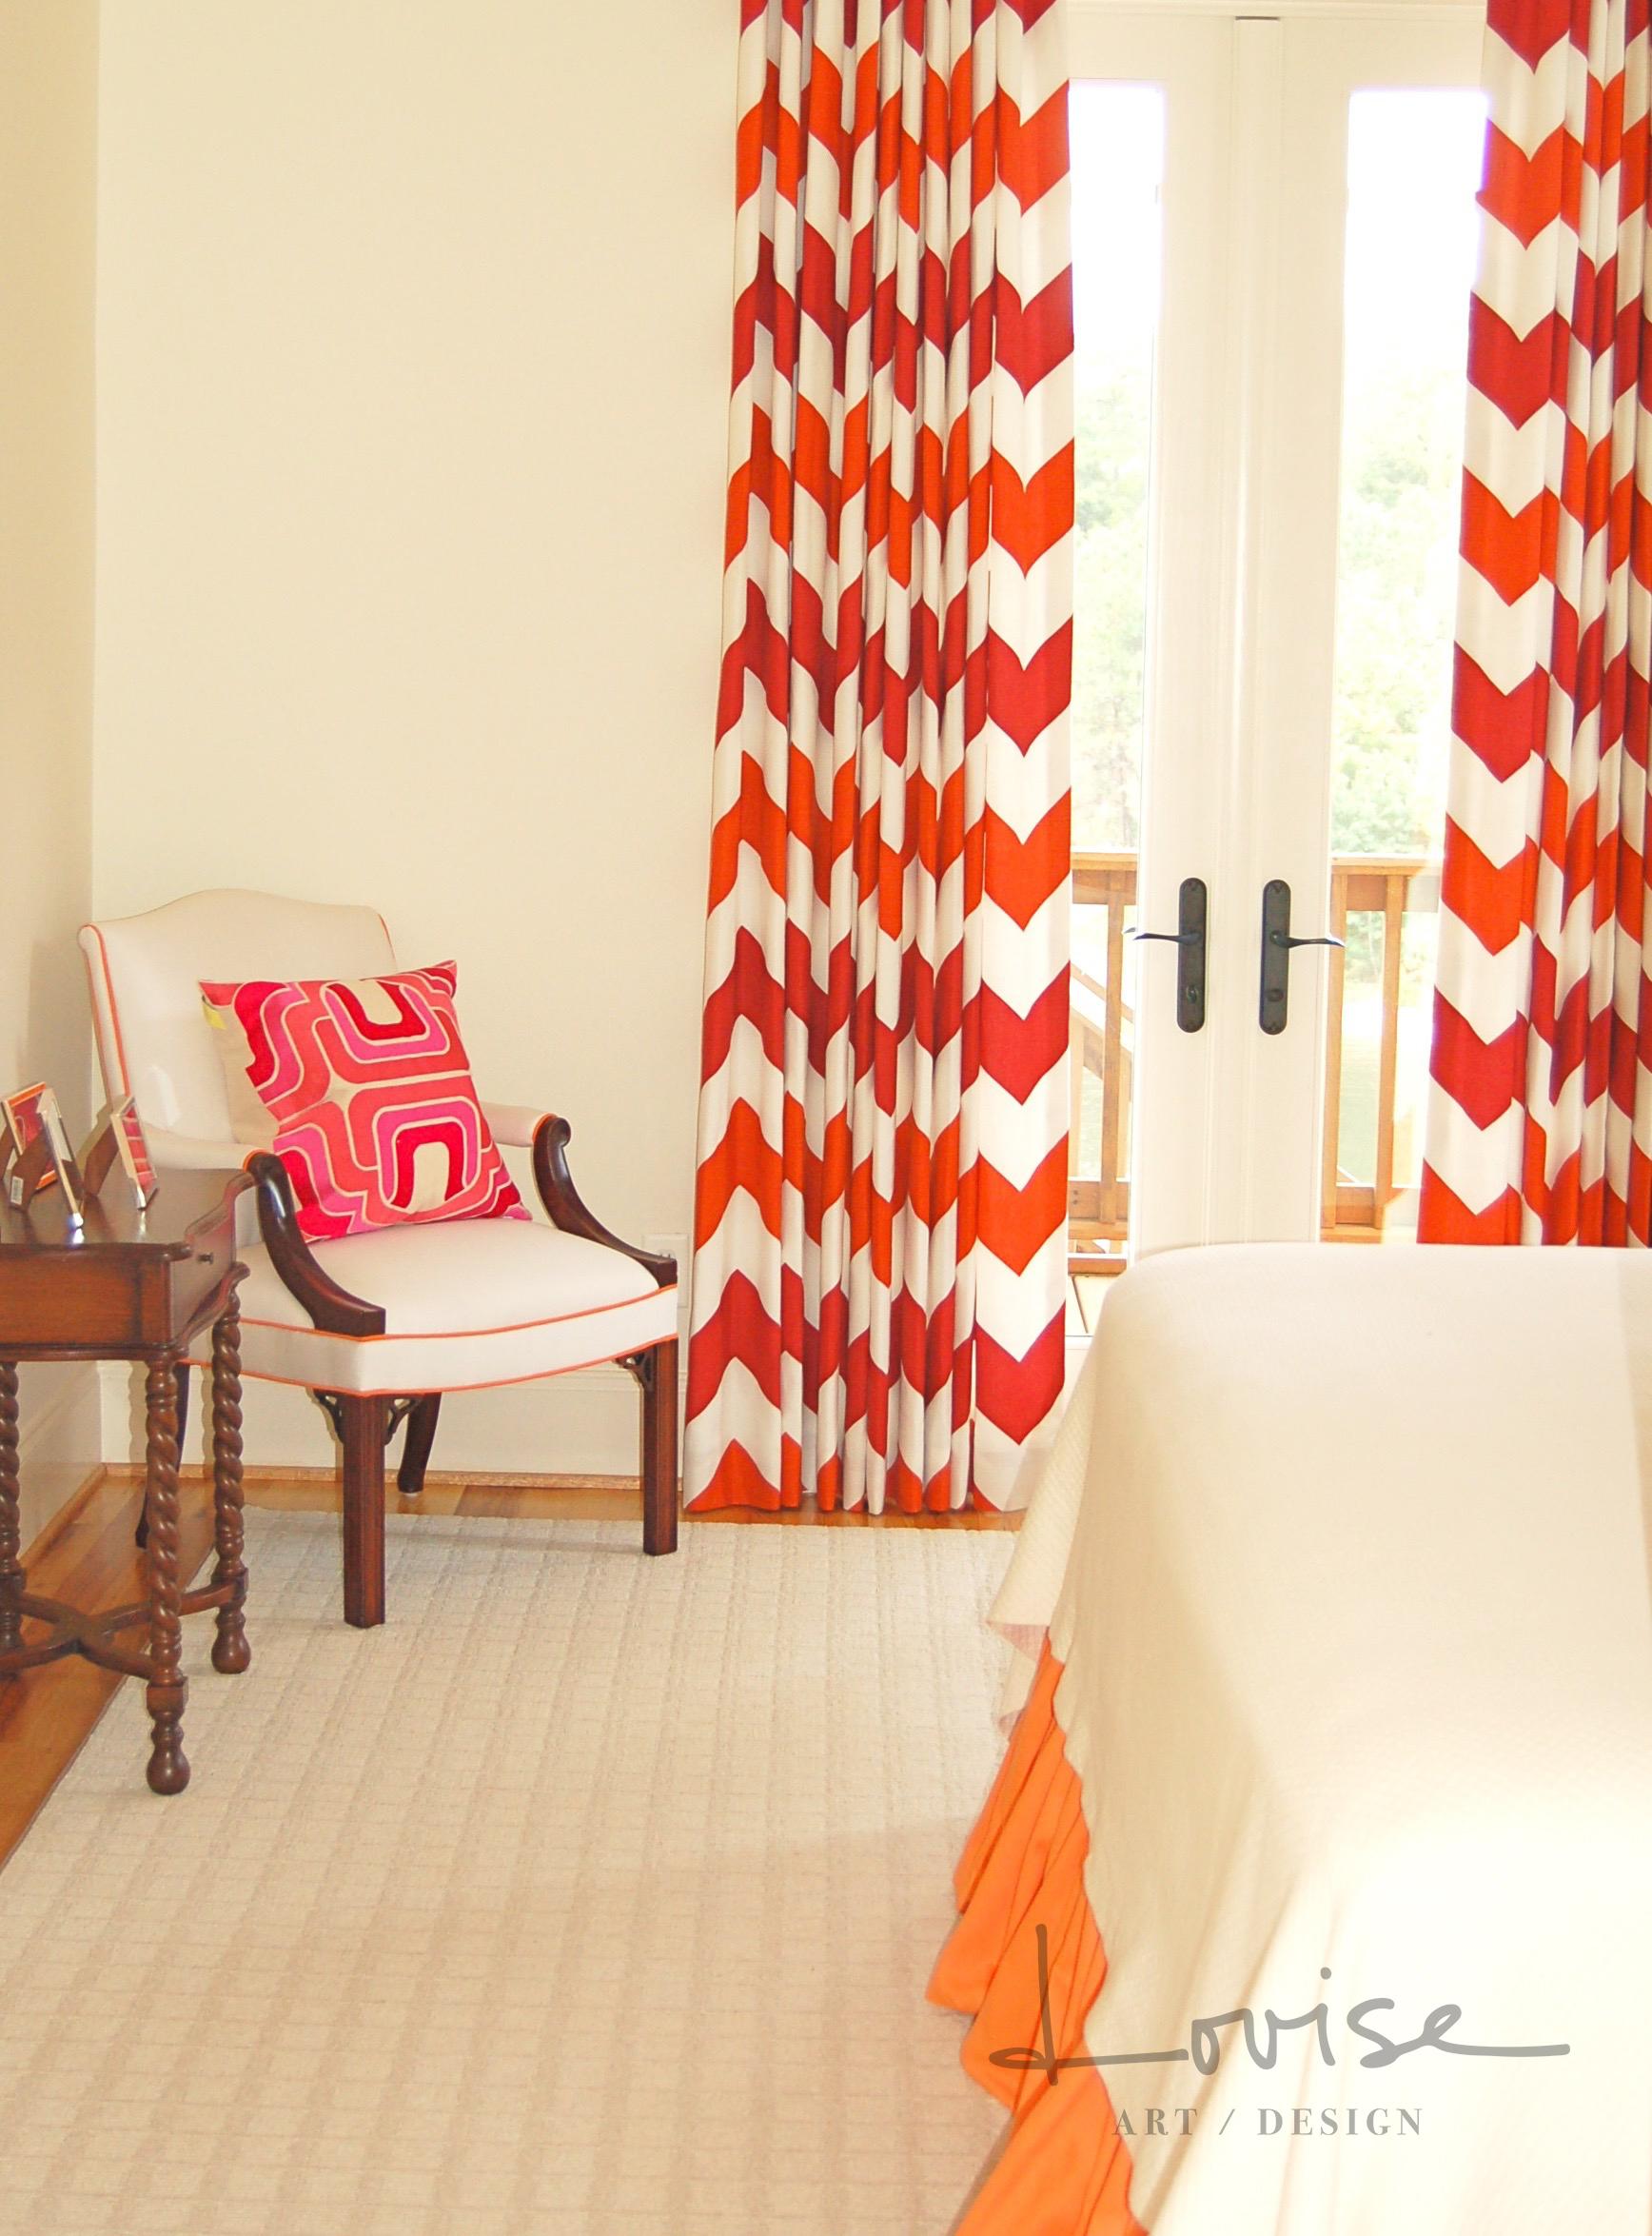 Lake bedroom with red and orange chevron draperies